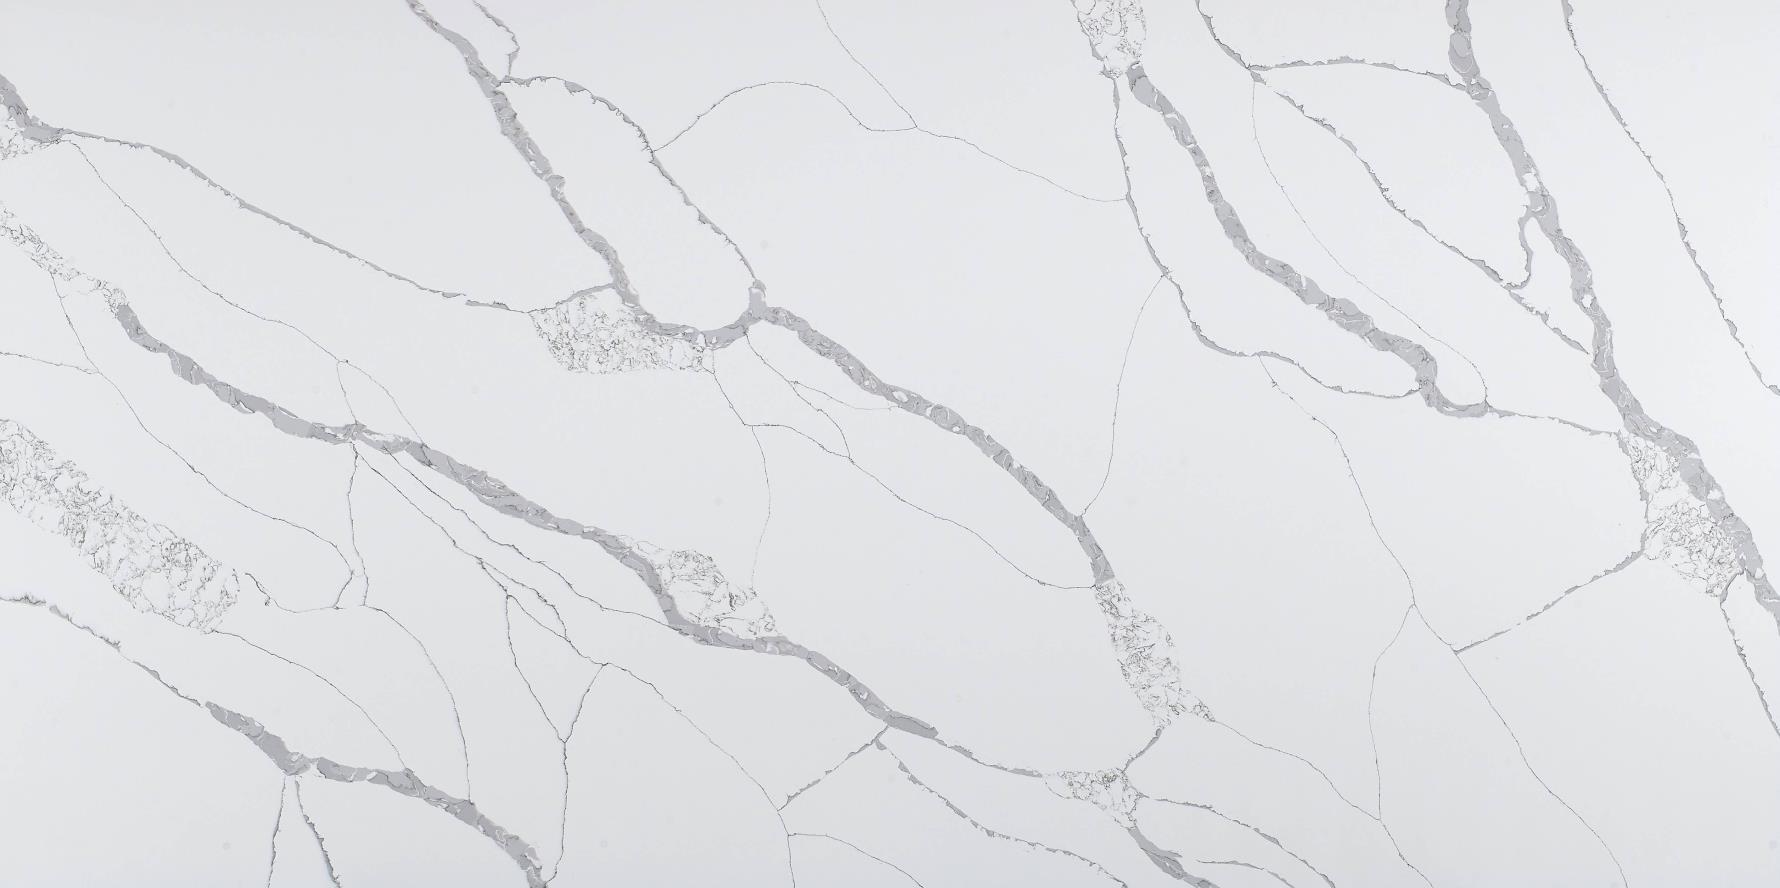 Wholesale White Polished Quartz Slabs K9916